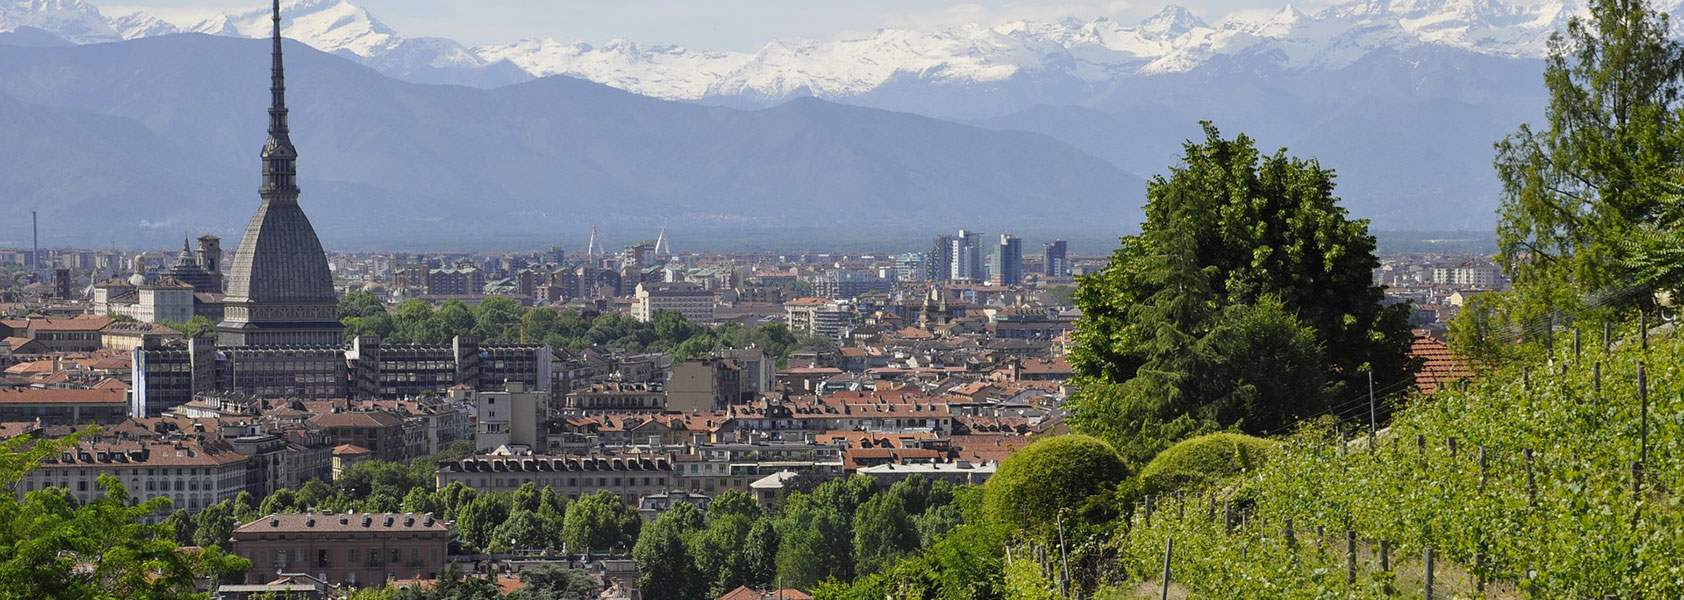 Italië | E-bike vakantie Piemonte